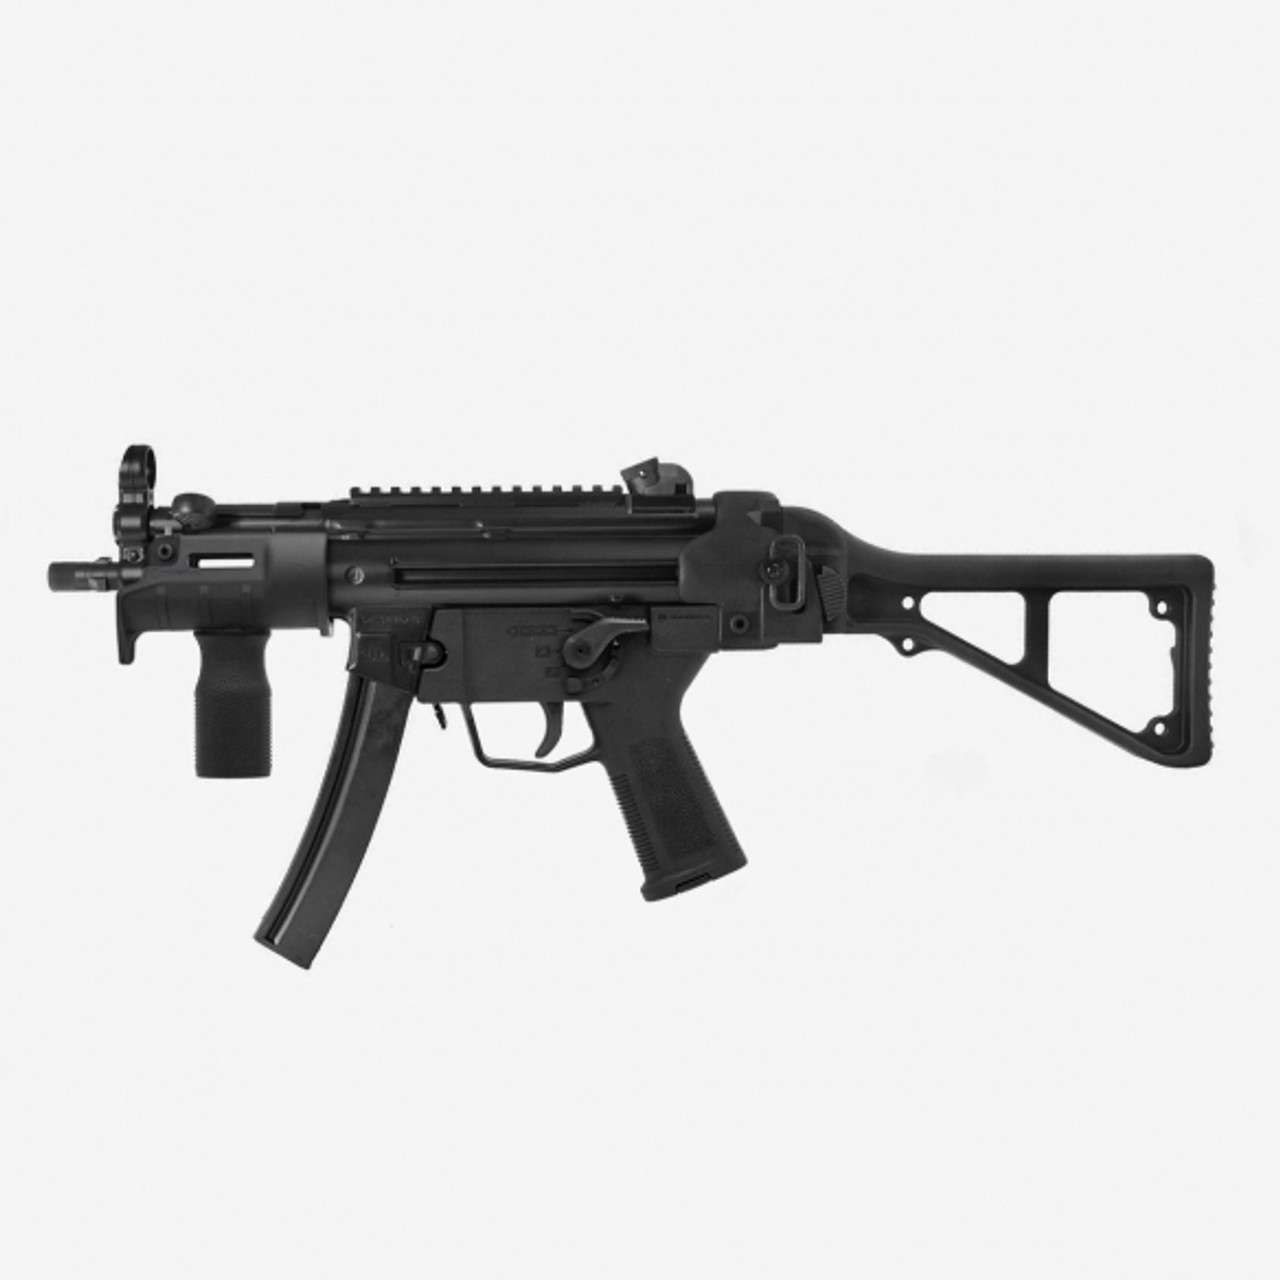 Magpul ESK ESK Selector - SL Grip Module & HK Polymer Trigger Housings